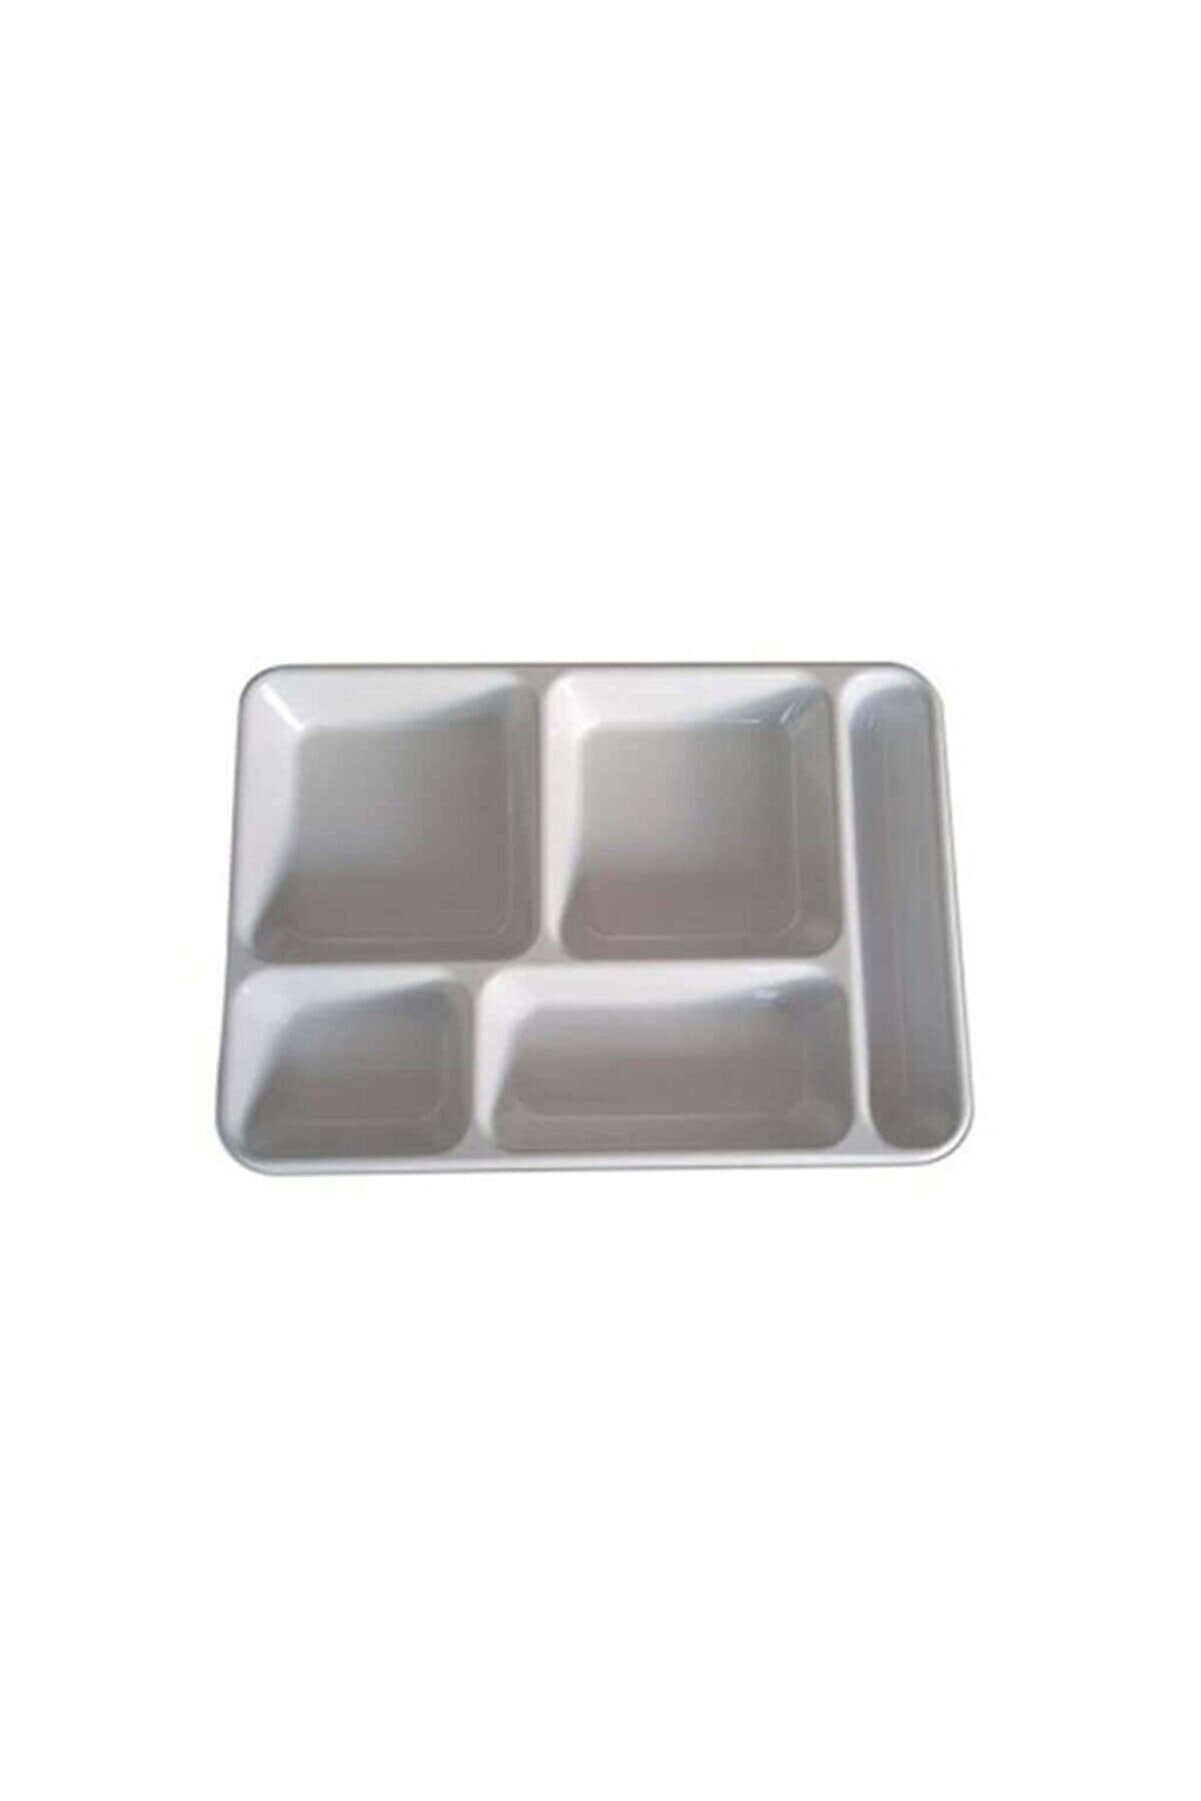 Plastport Tabldot (self Servis)-pc (polikarbon)-standart 10 Adet